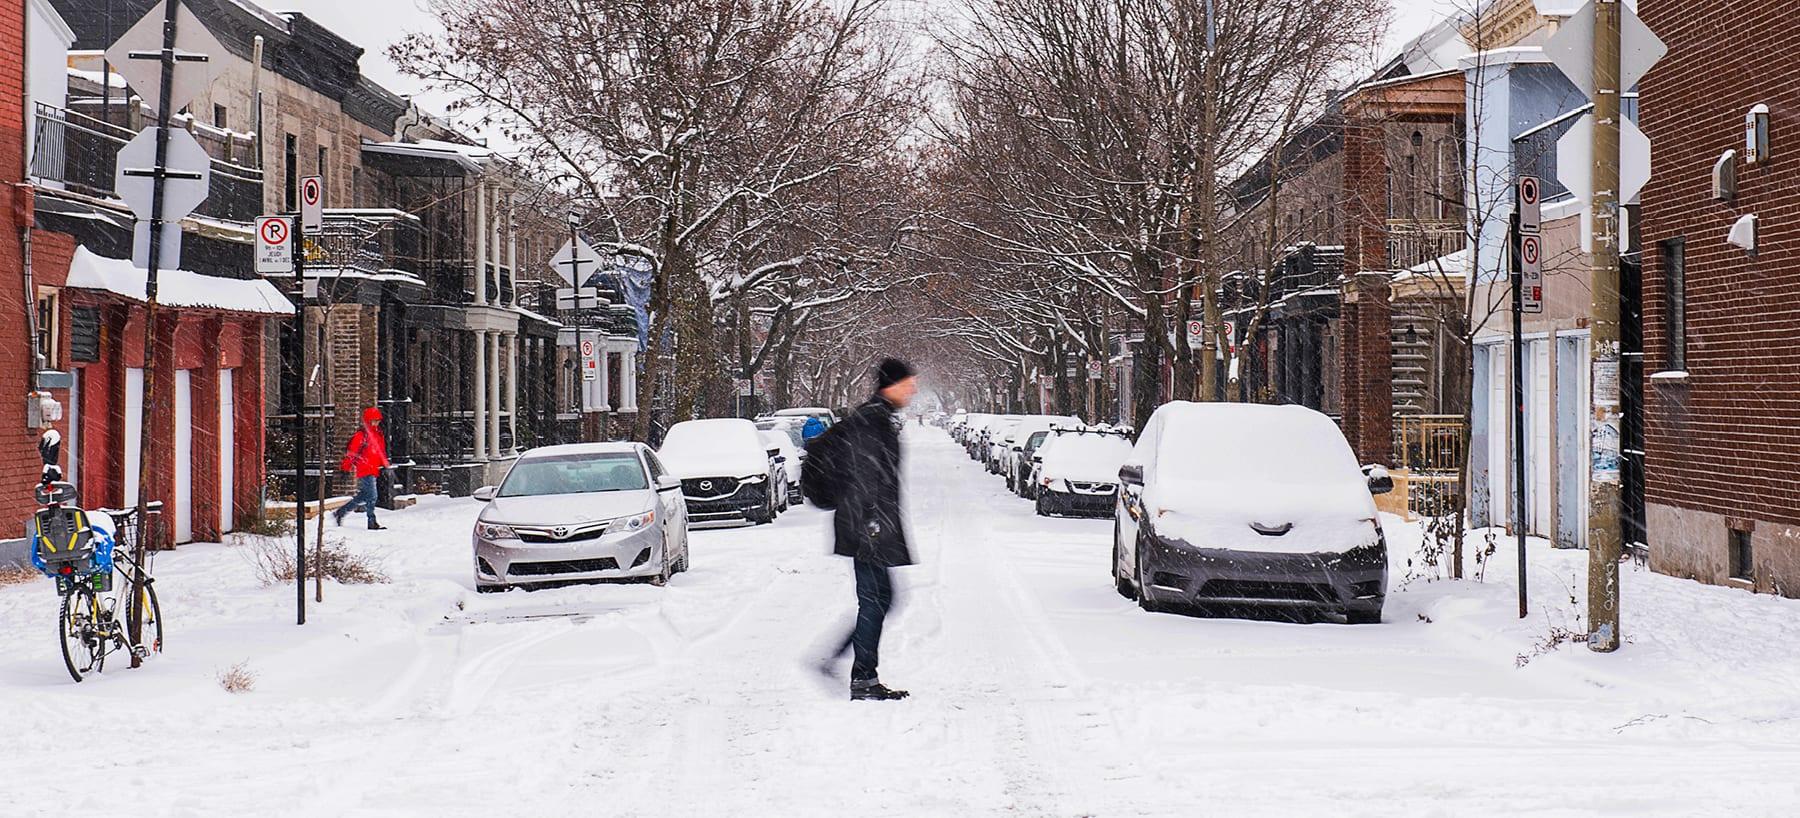 Pedestrian crossing a snowy street